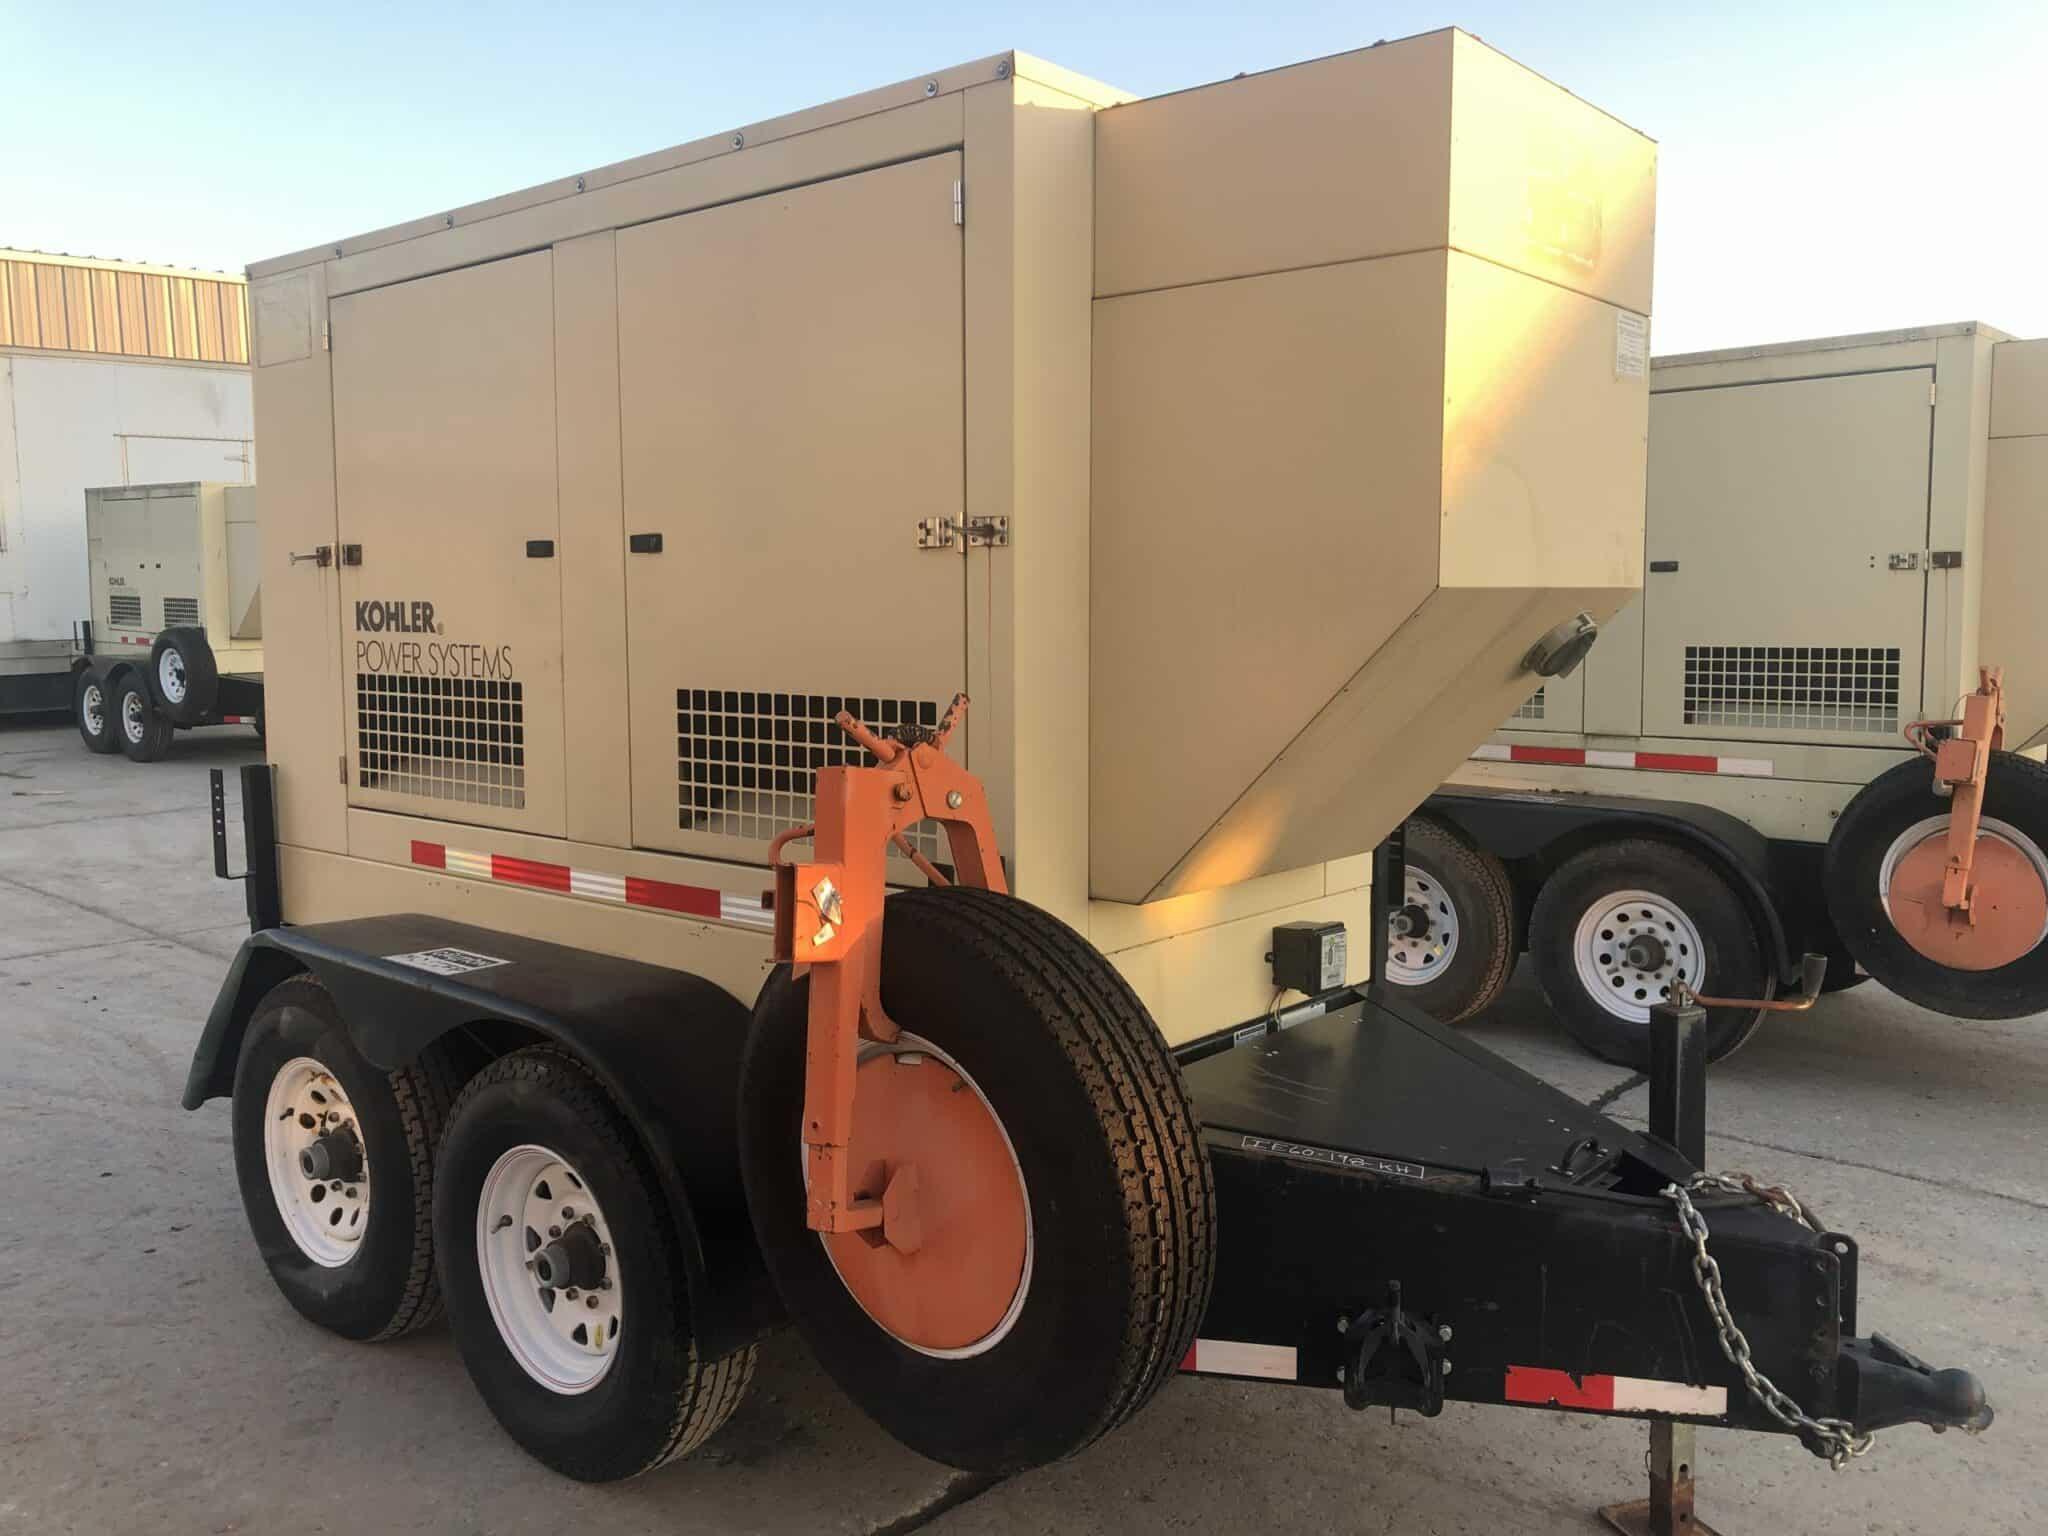 Used 50 kW Kohler 60REOZJB-NEX Portable Diesel Generators – EPA Tier 2 – 8 Available – COMING IN!